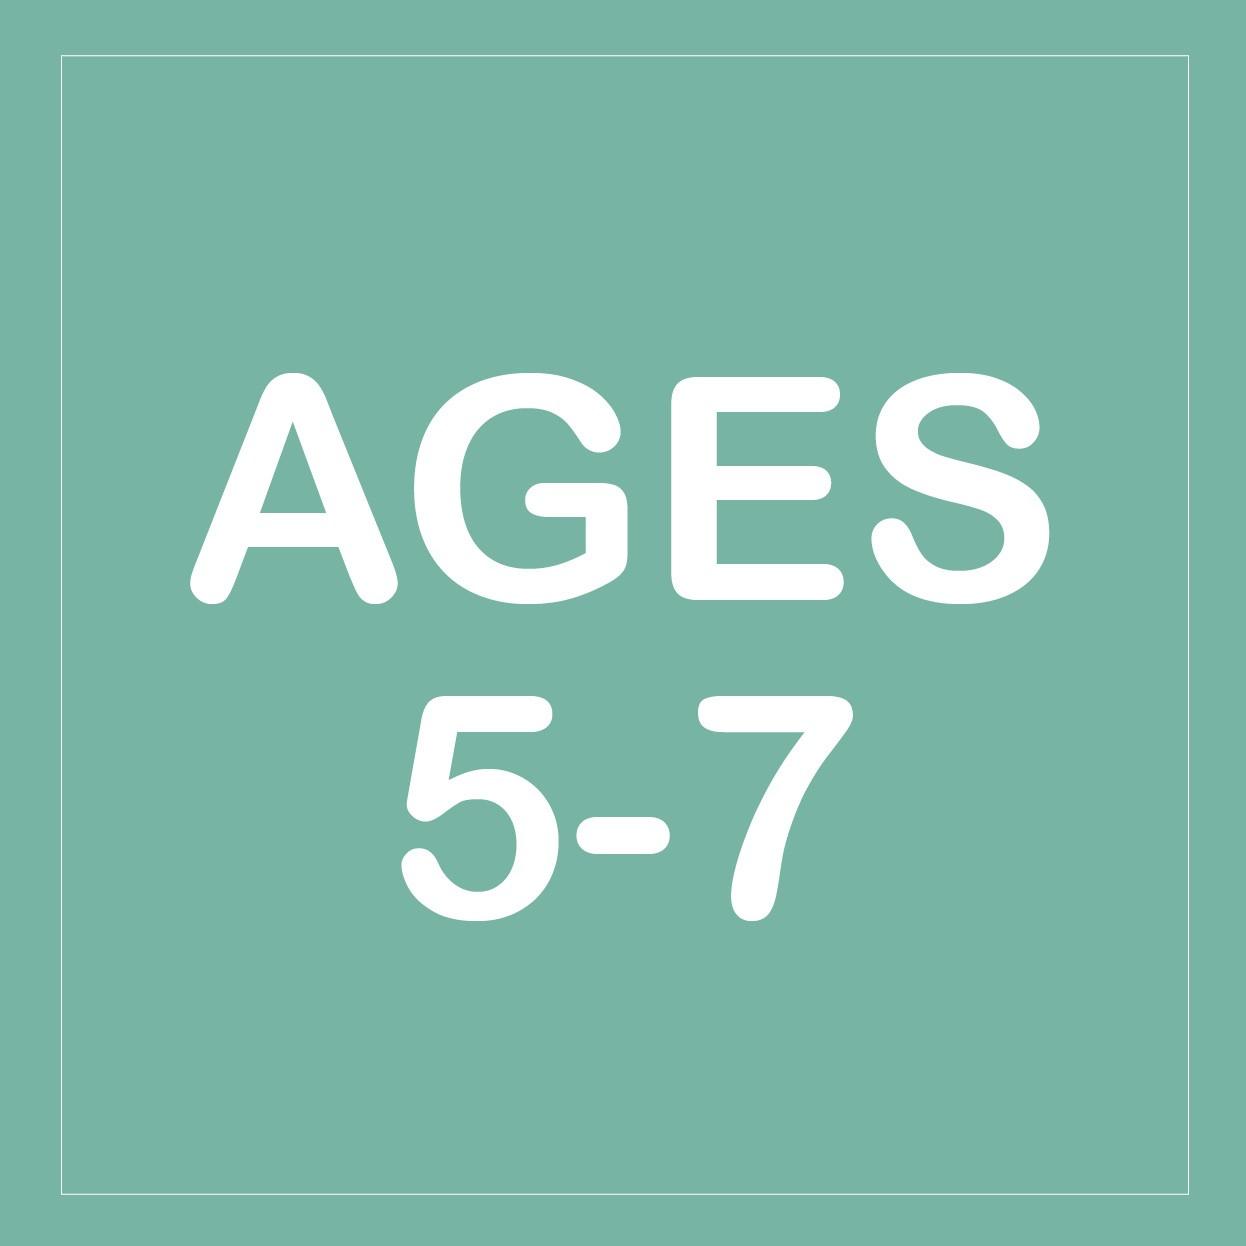 Age 5 - 7